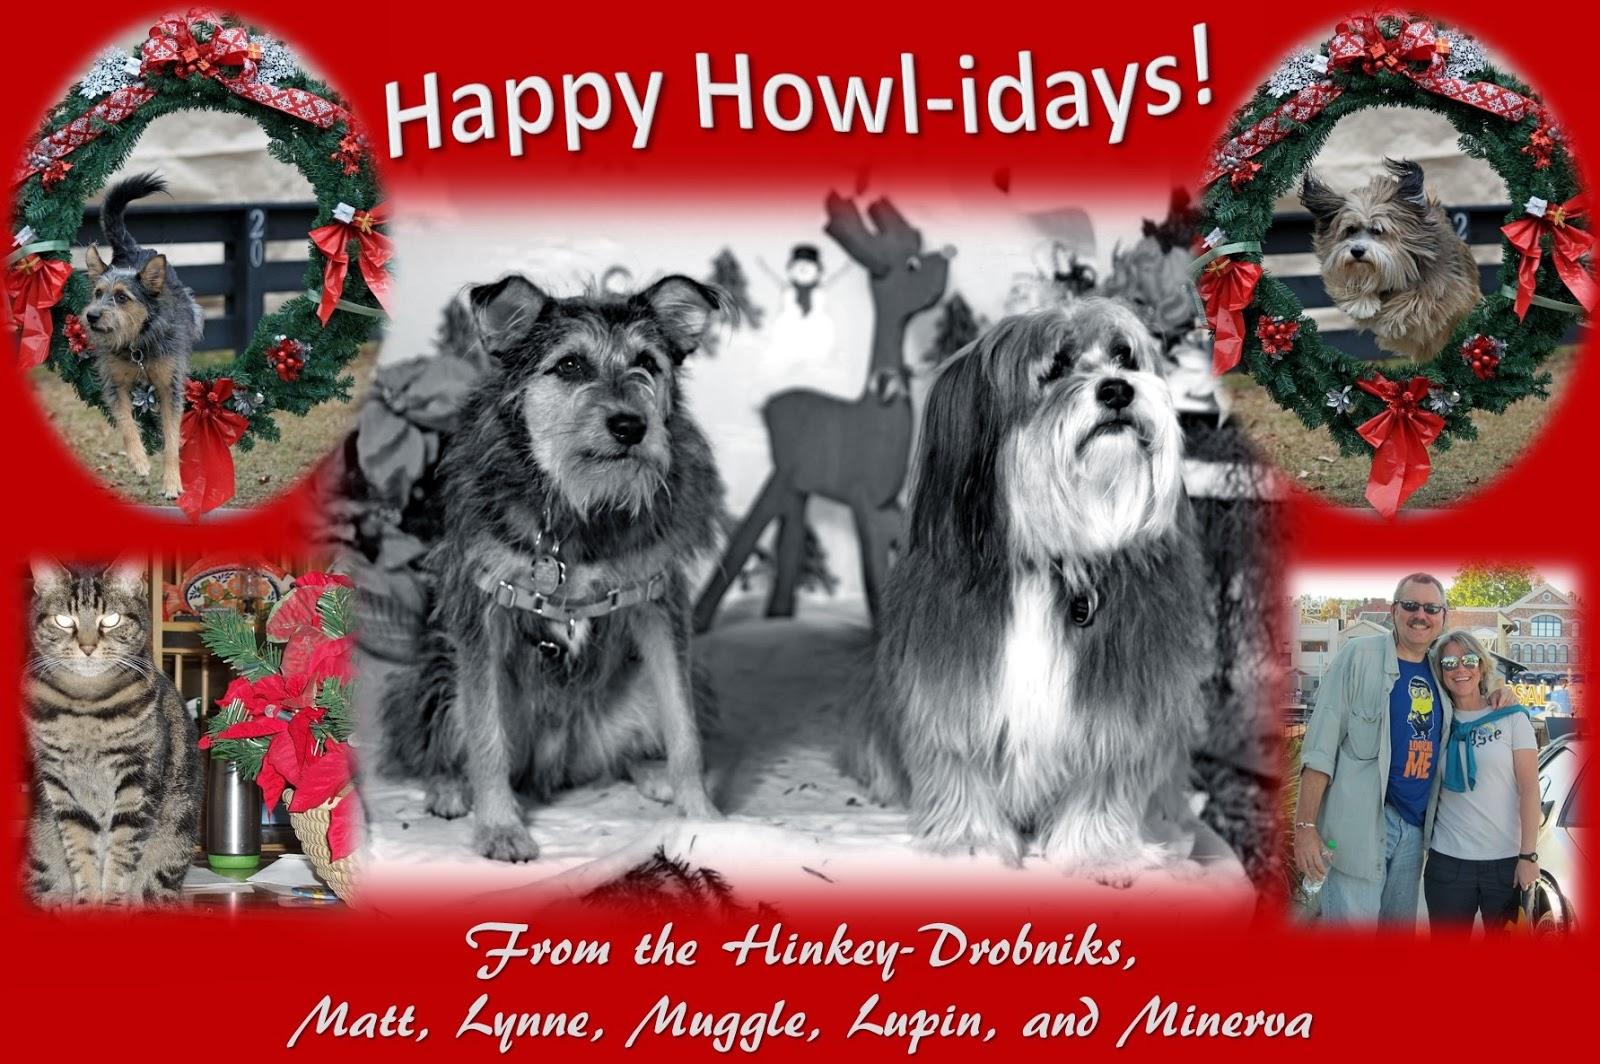 2014 Hinkey Drobnik Christmas Card